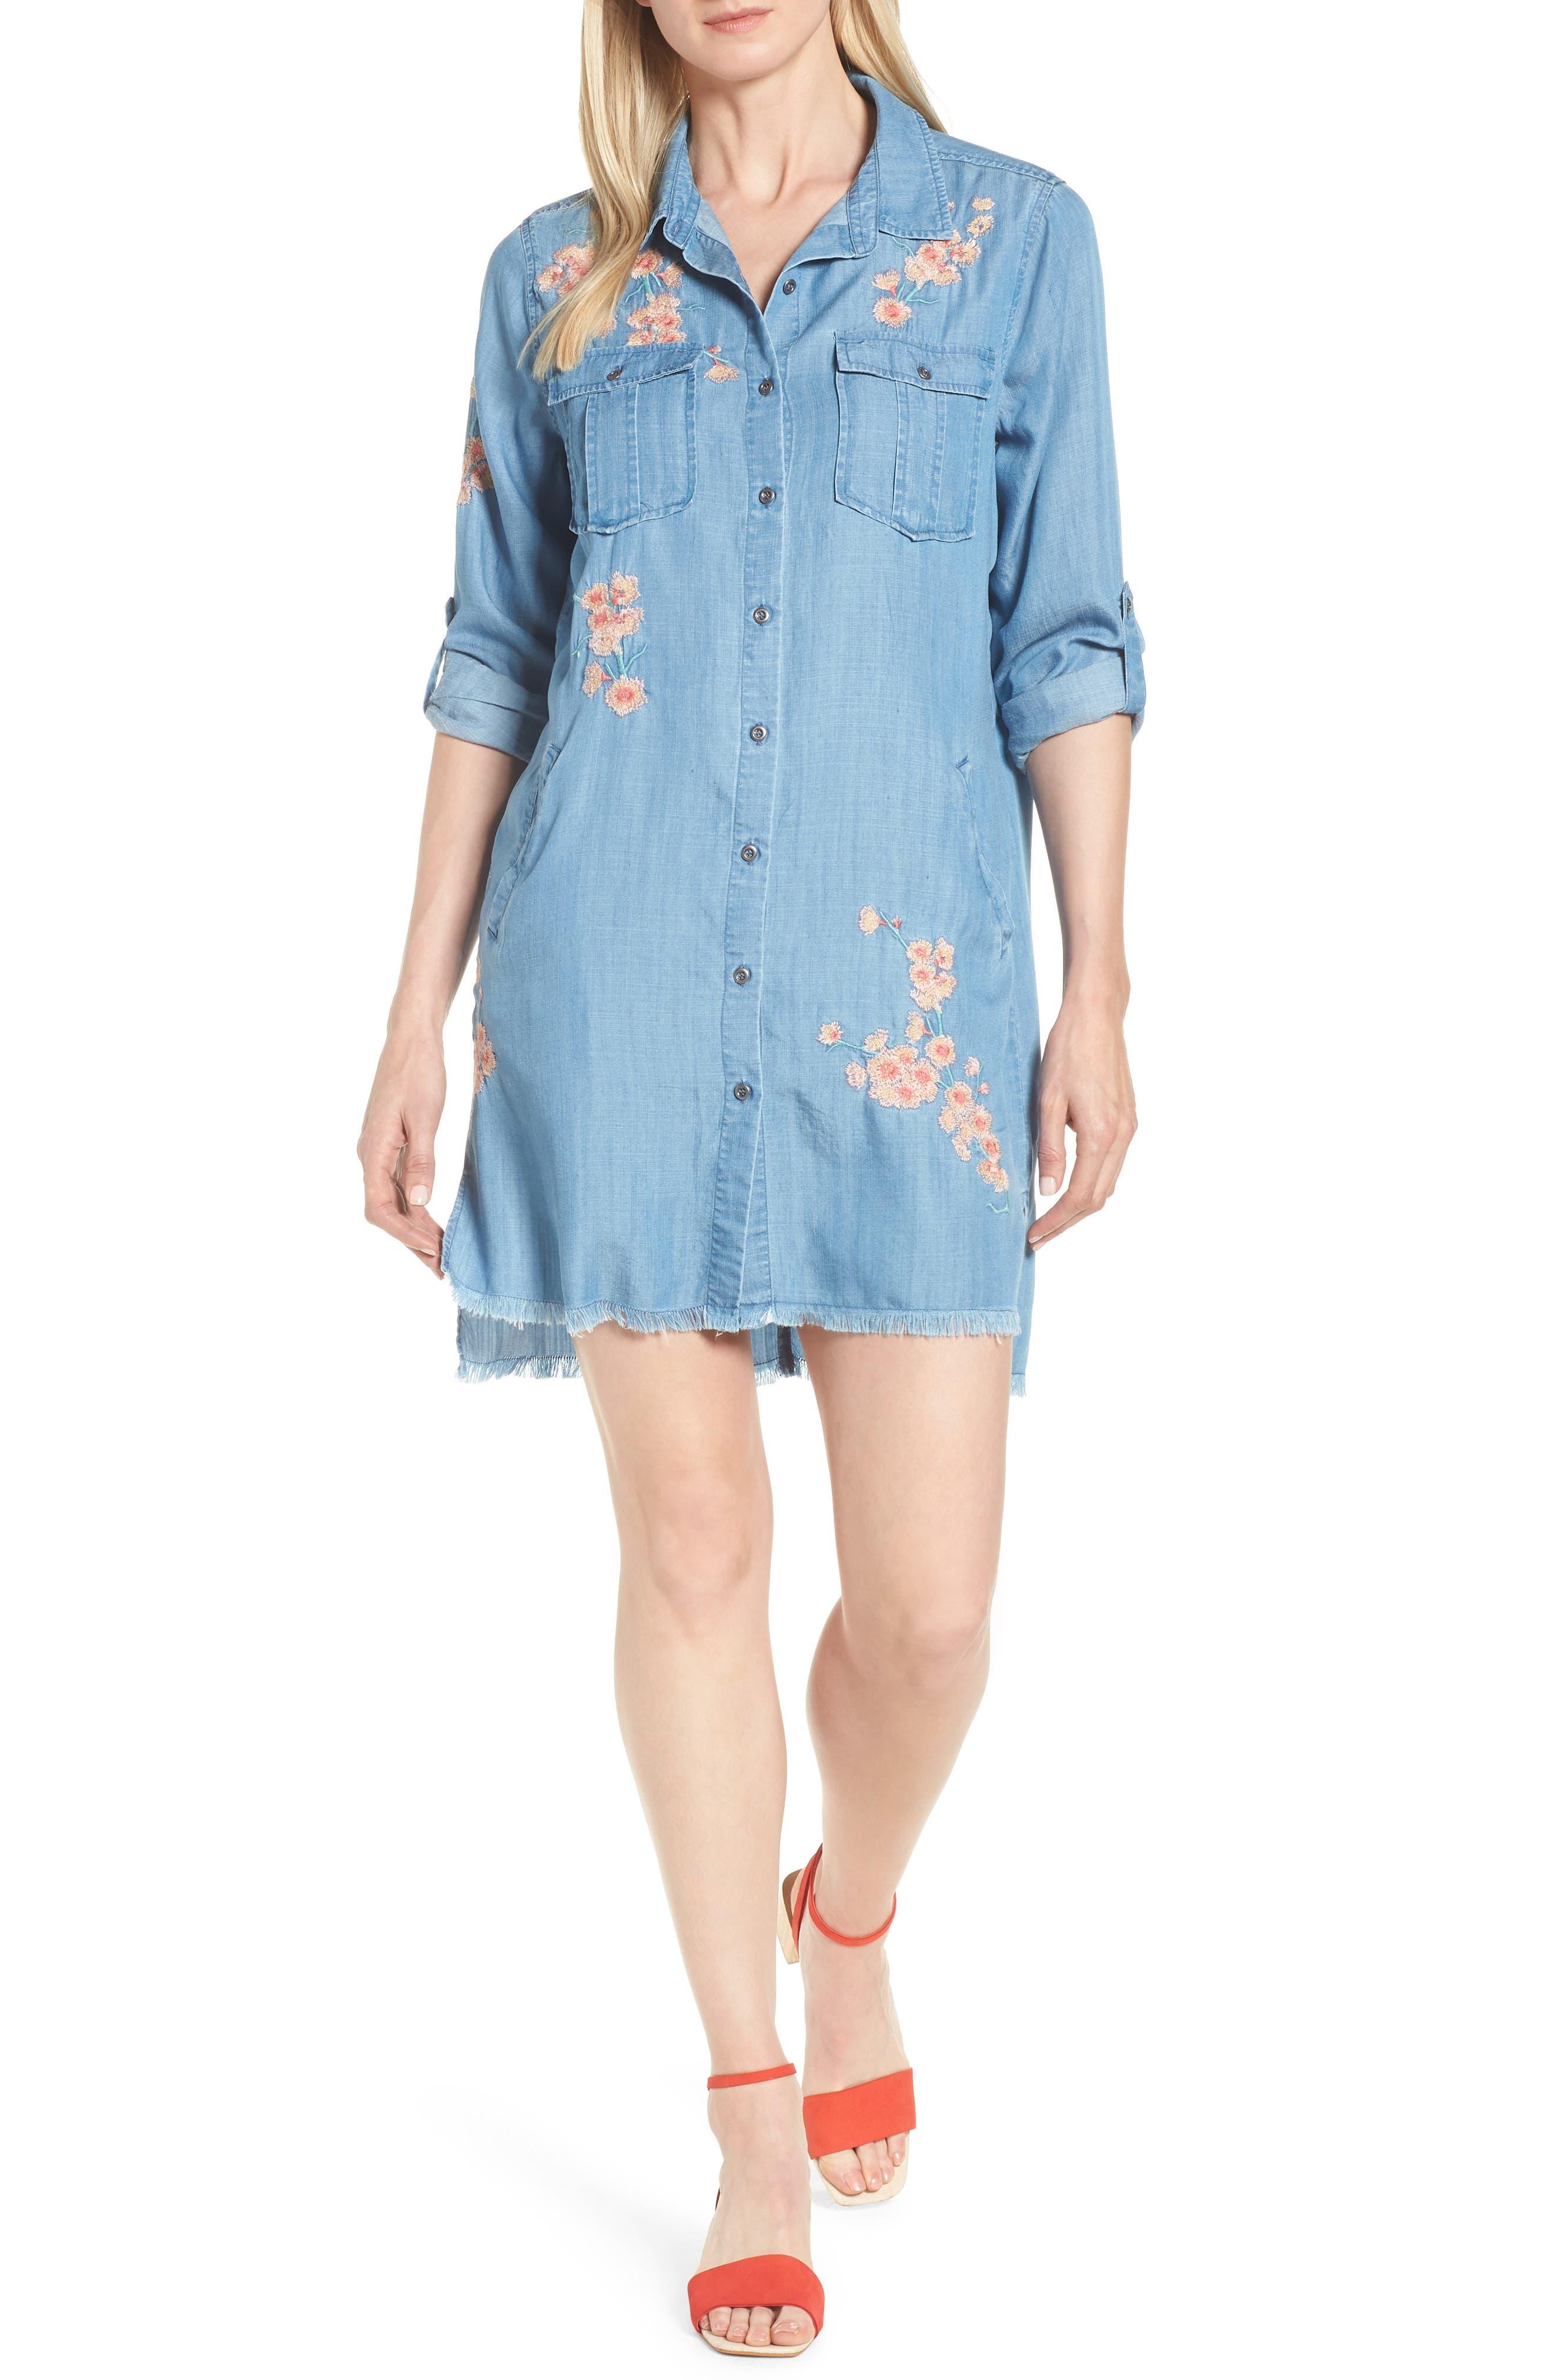 Billy T Cherry Blossom Shirtdress